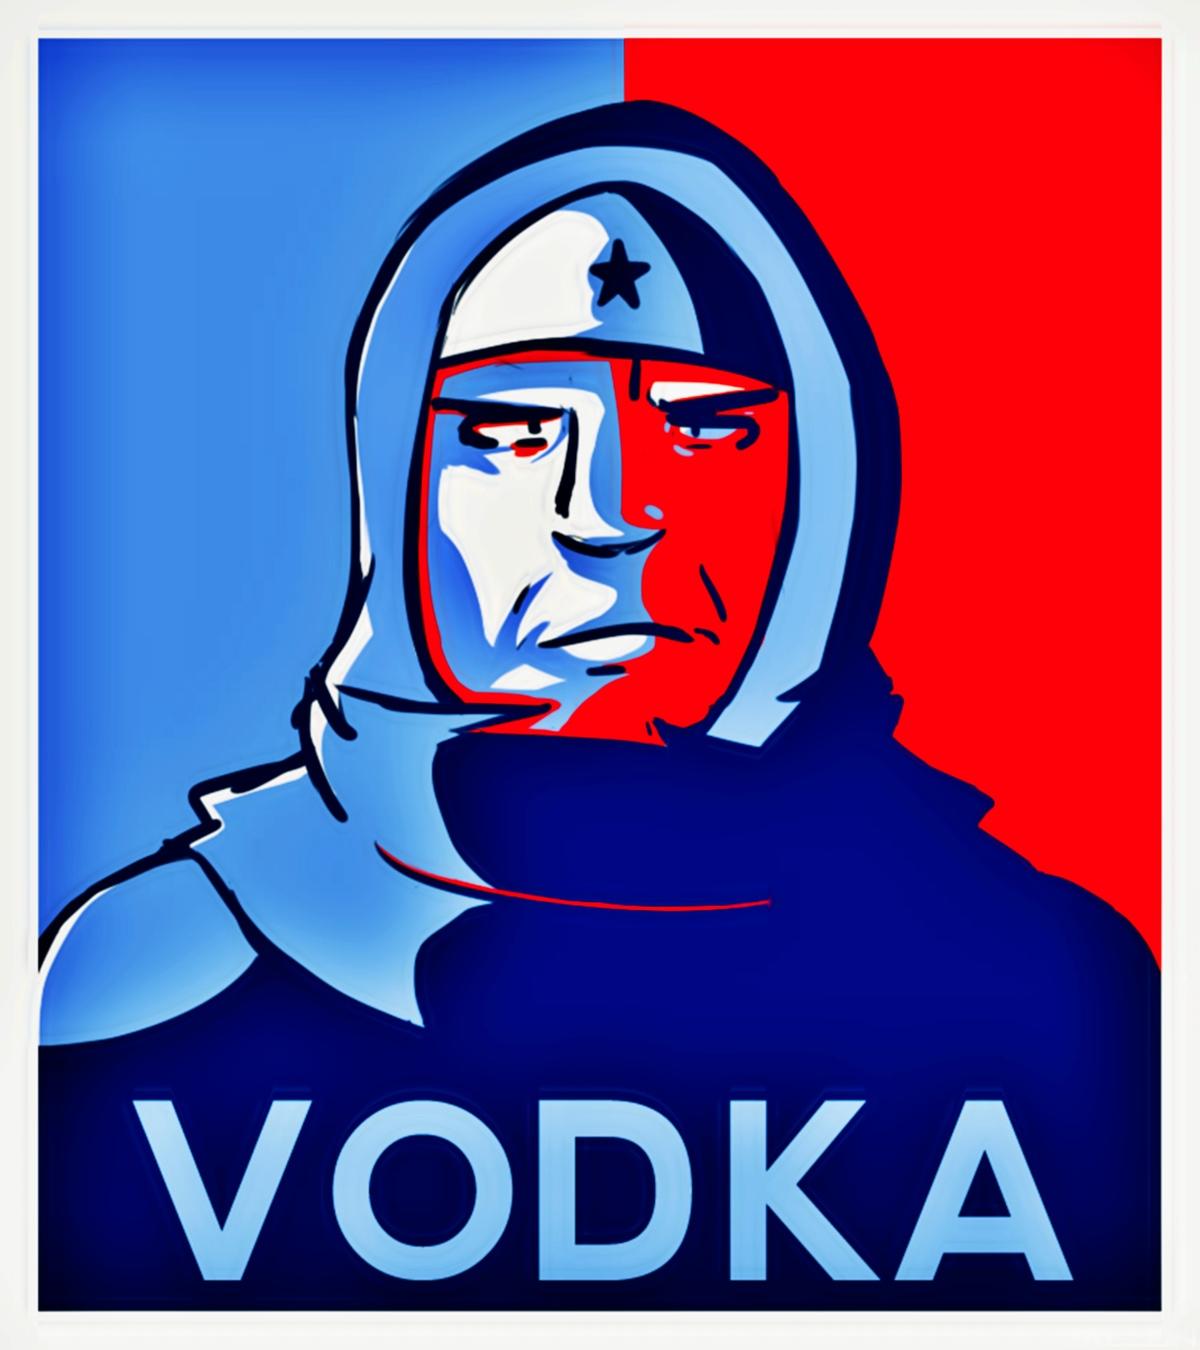 00 Russian Vodka. 08.09.13